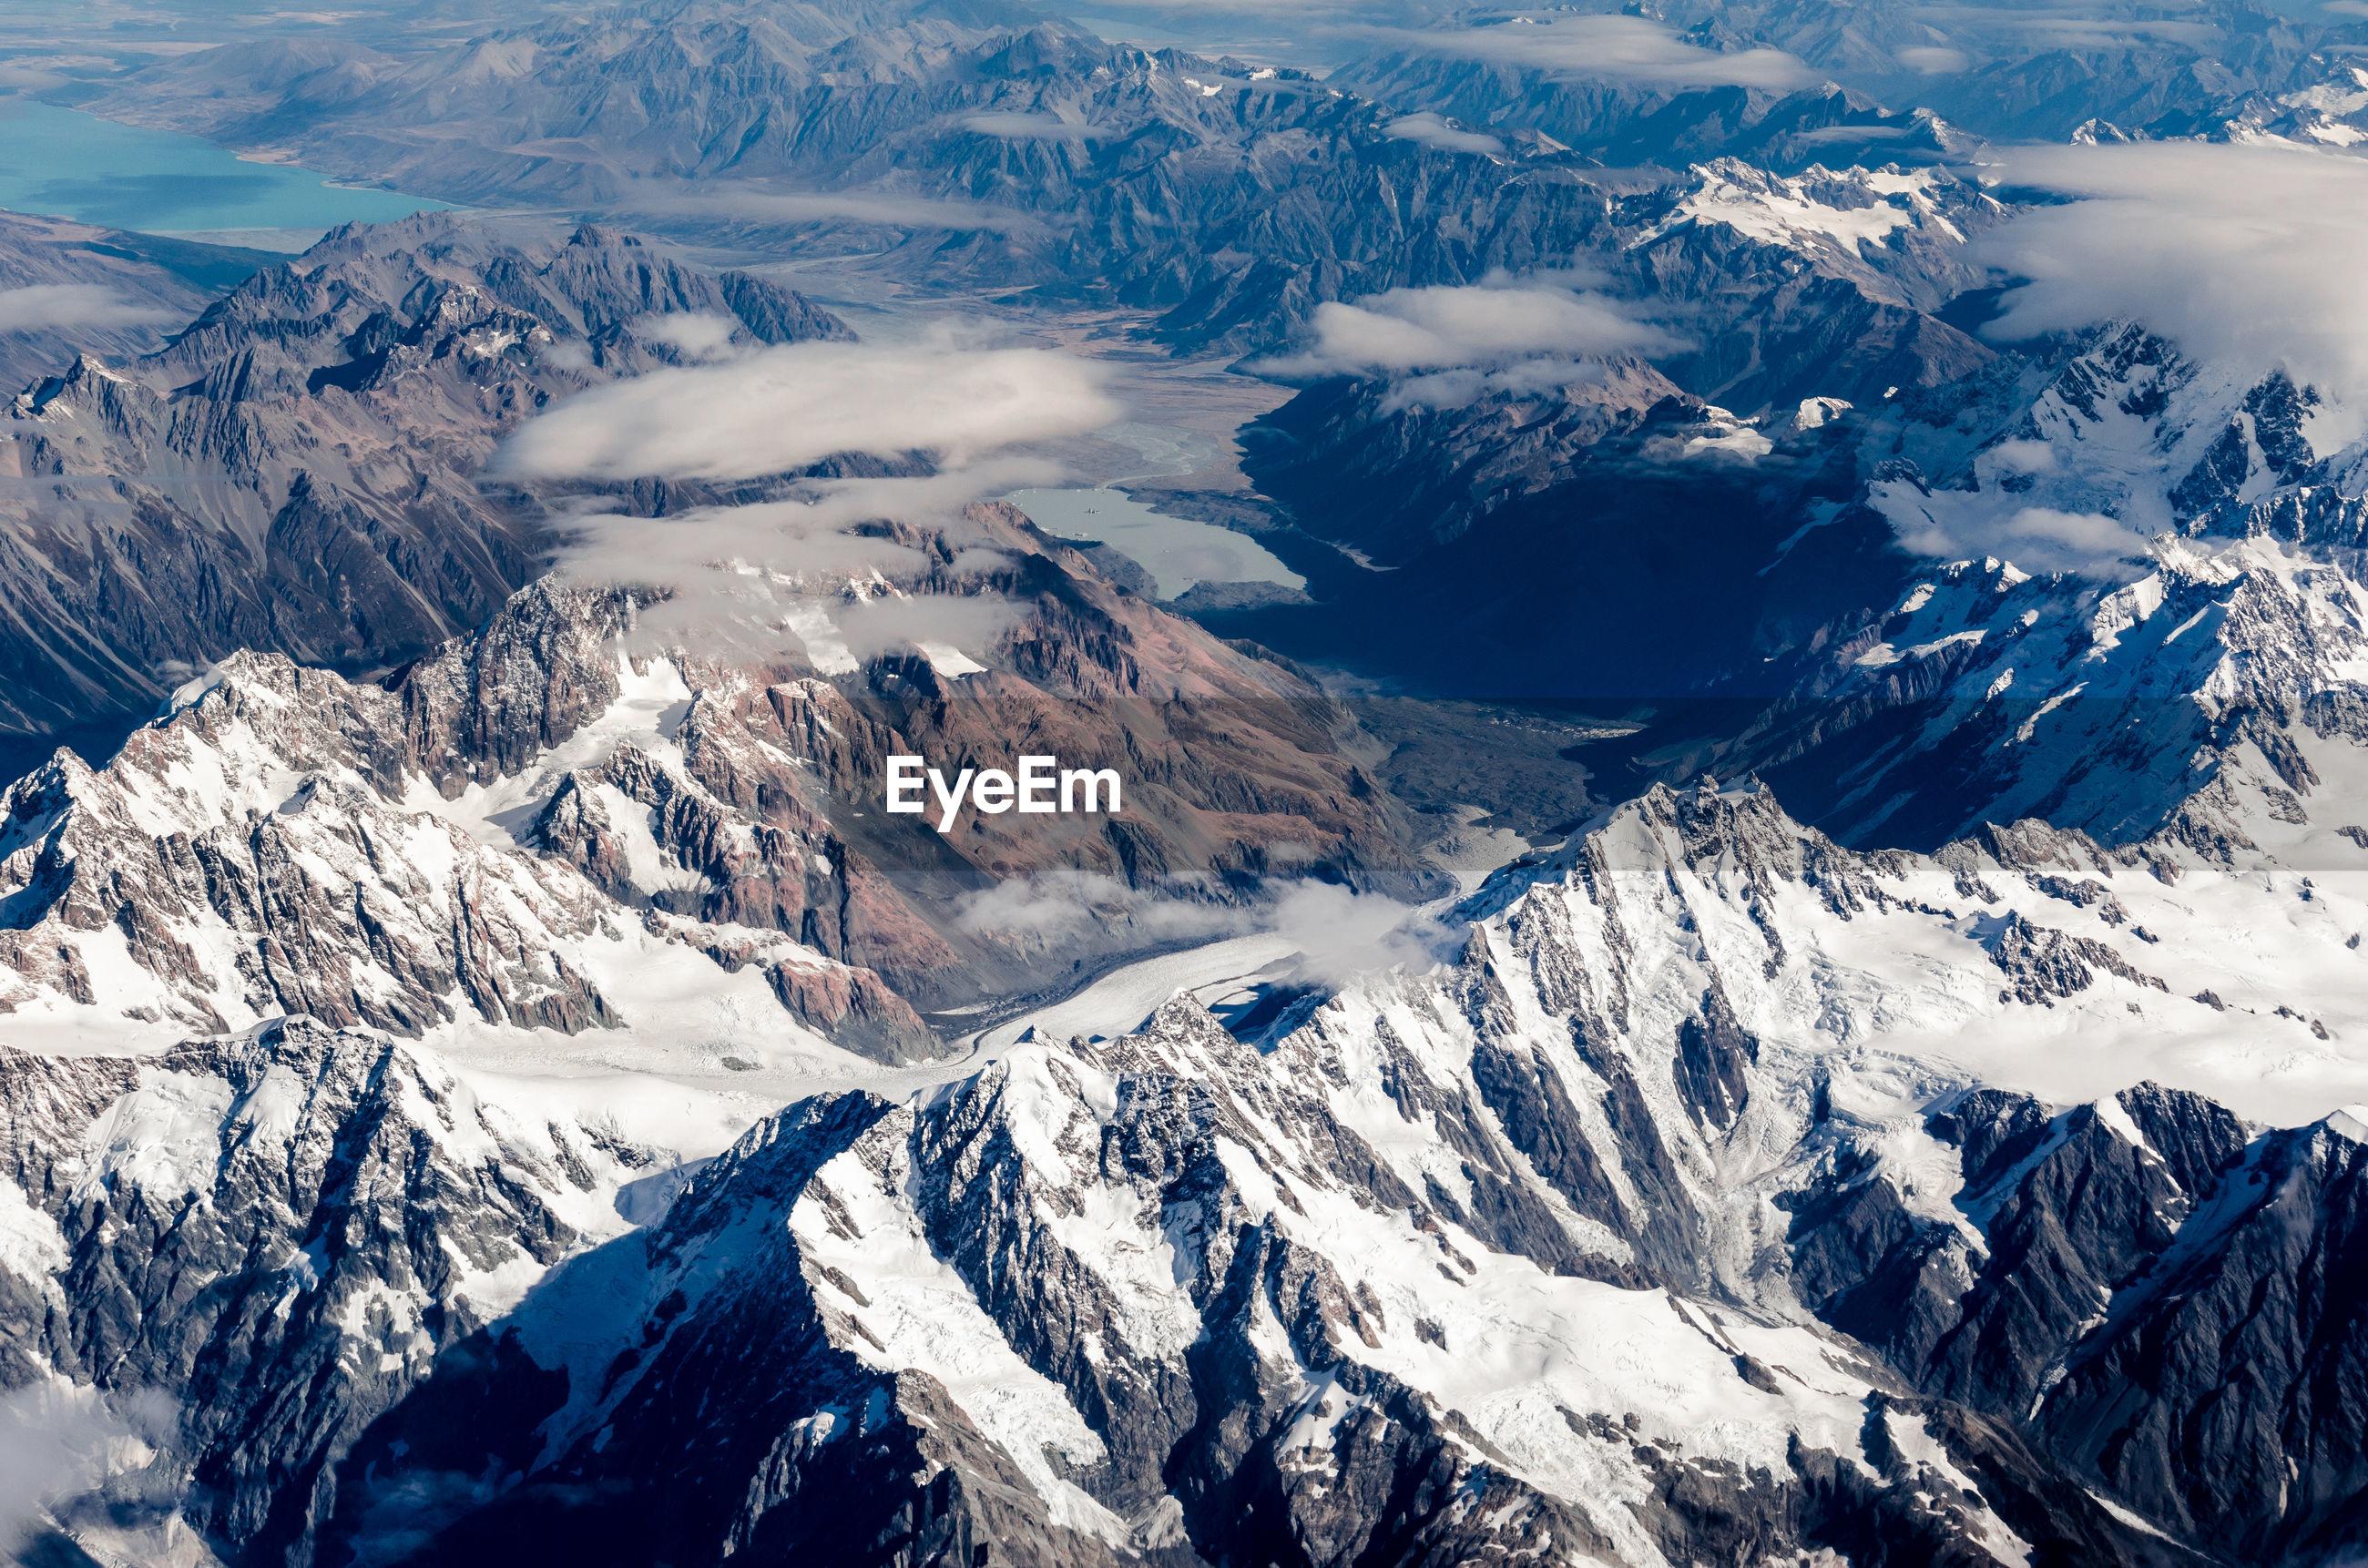 Southern alps, tasman glacier is the largest glacier in new zealand